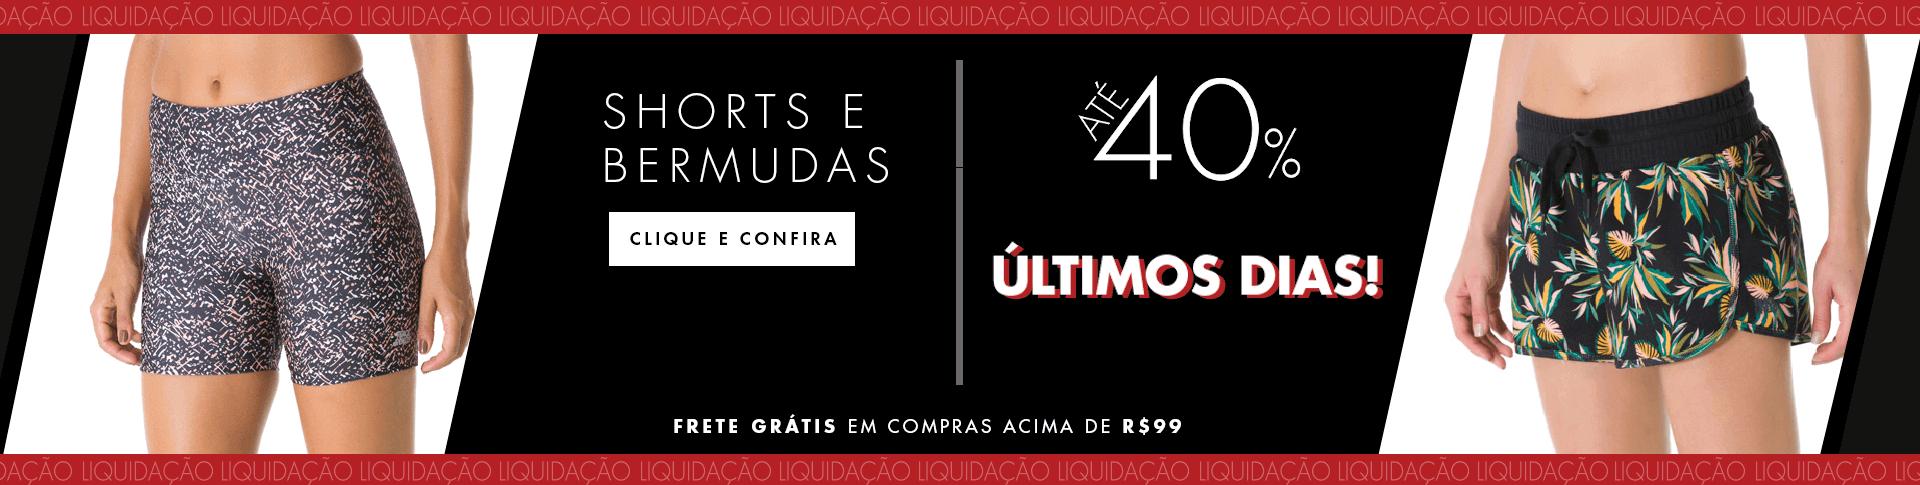 SHORTS FEMININOS ULTIMOS DIAS